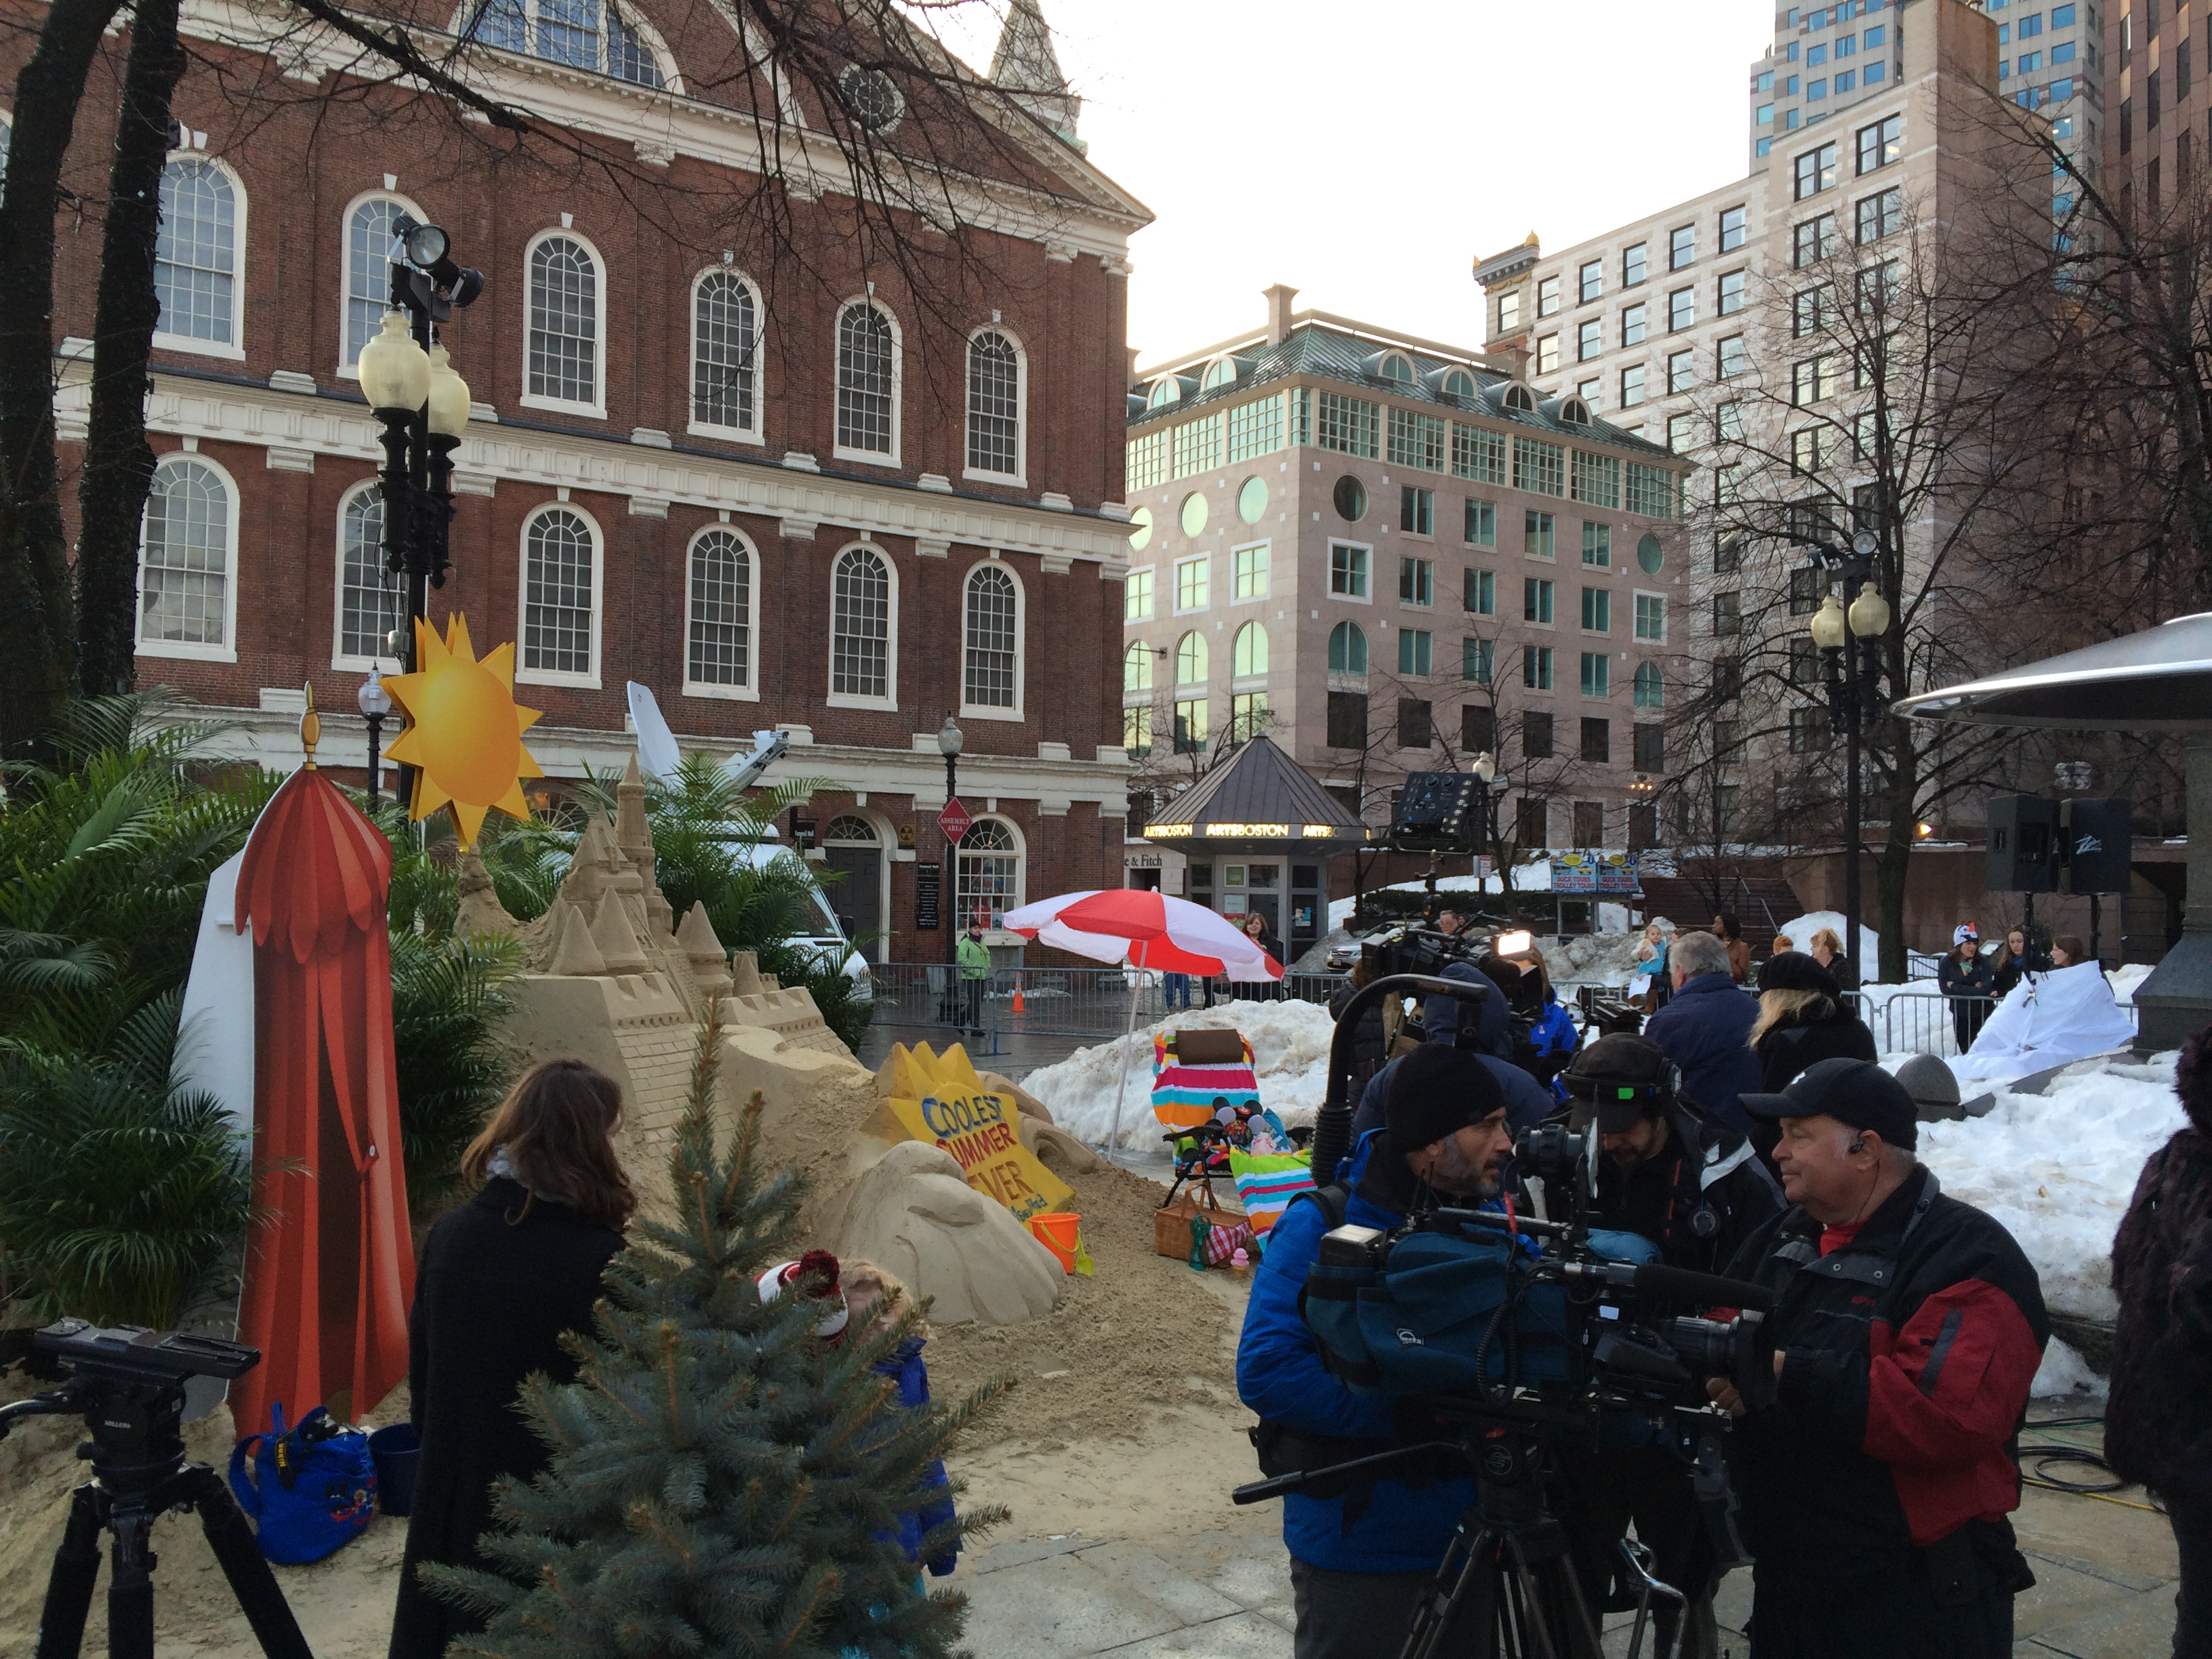 abc s ginger zee gma visit boston newser blog